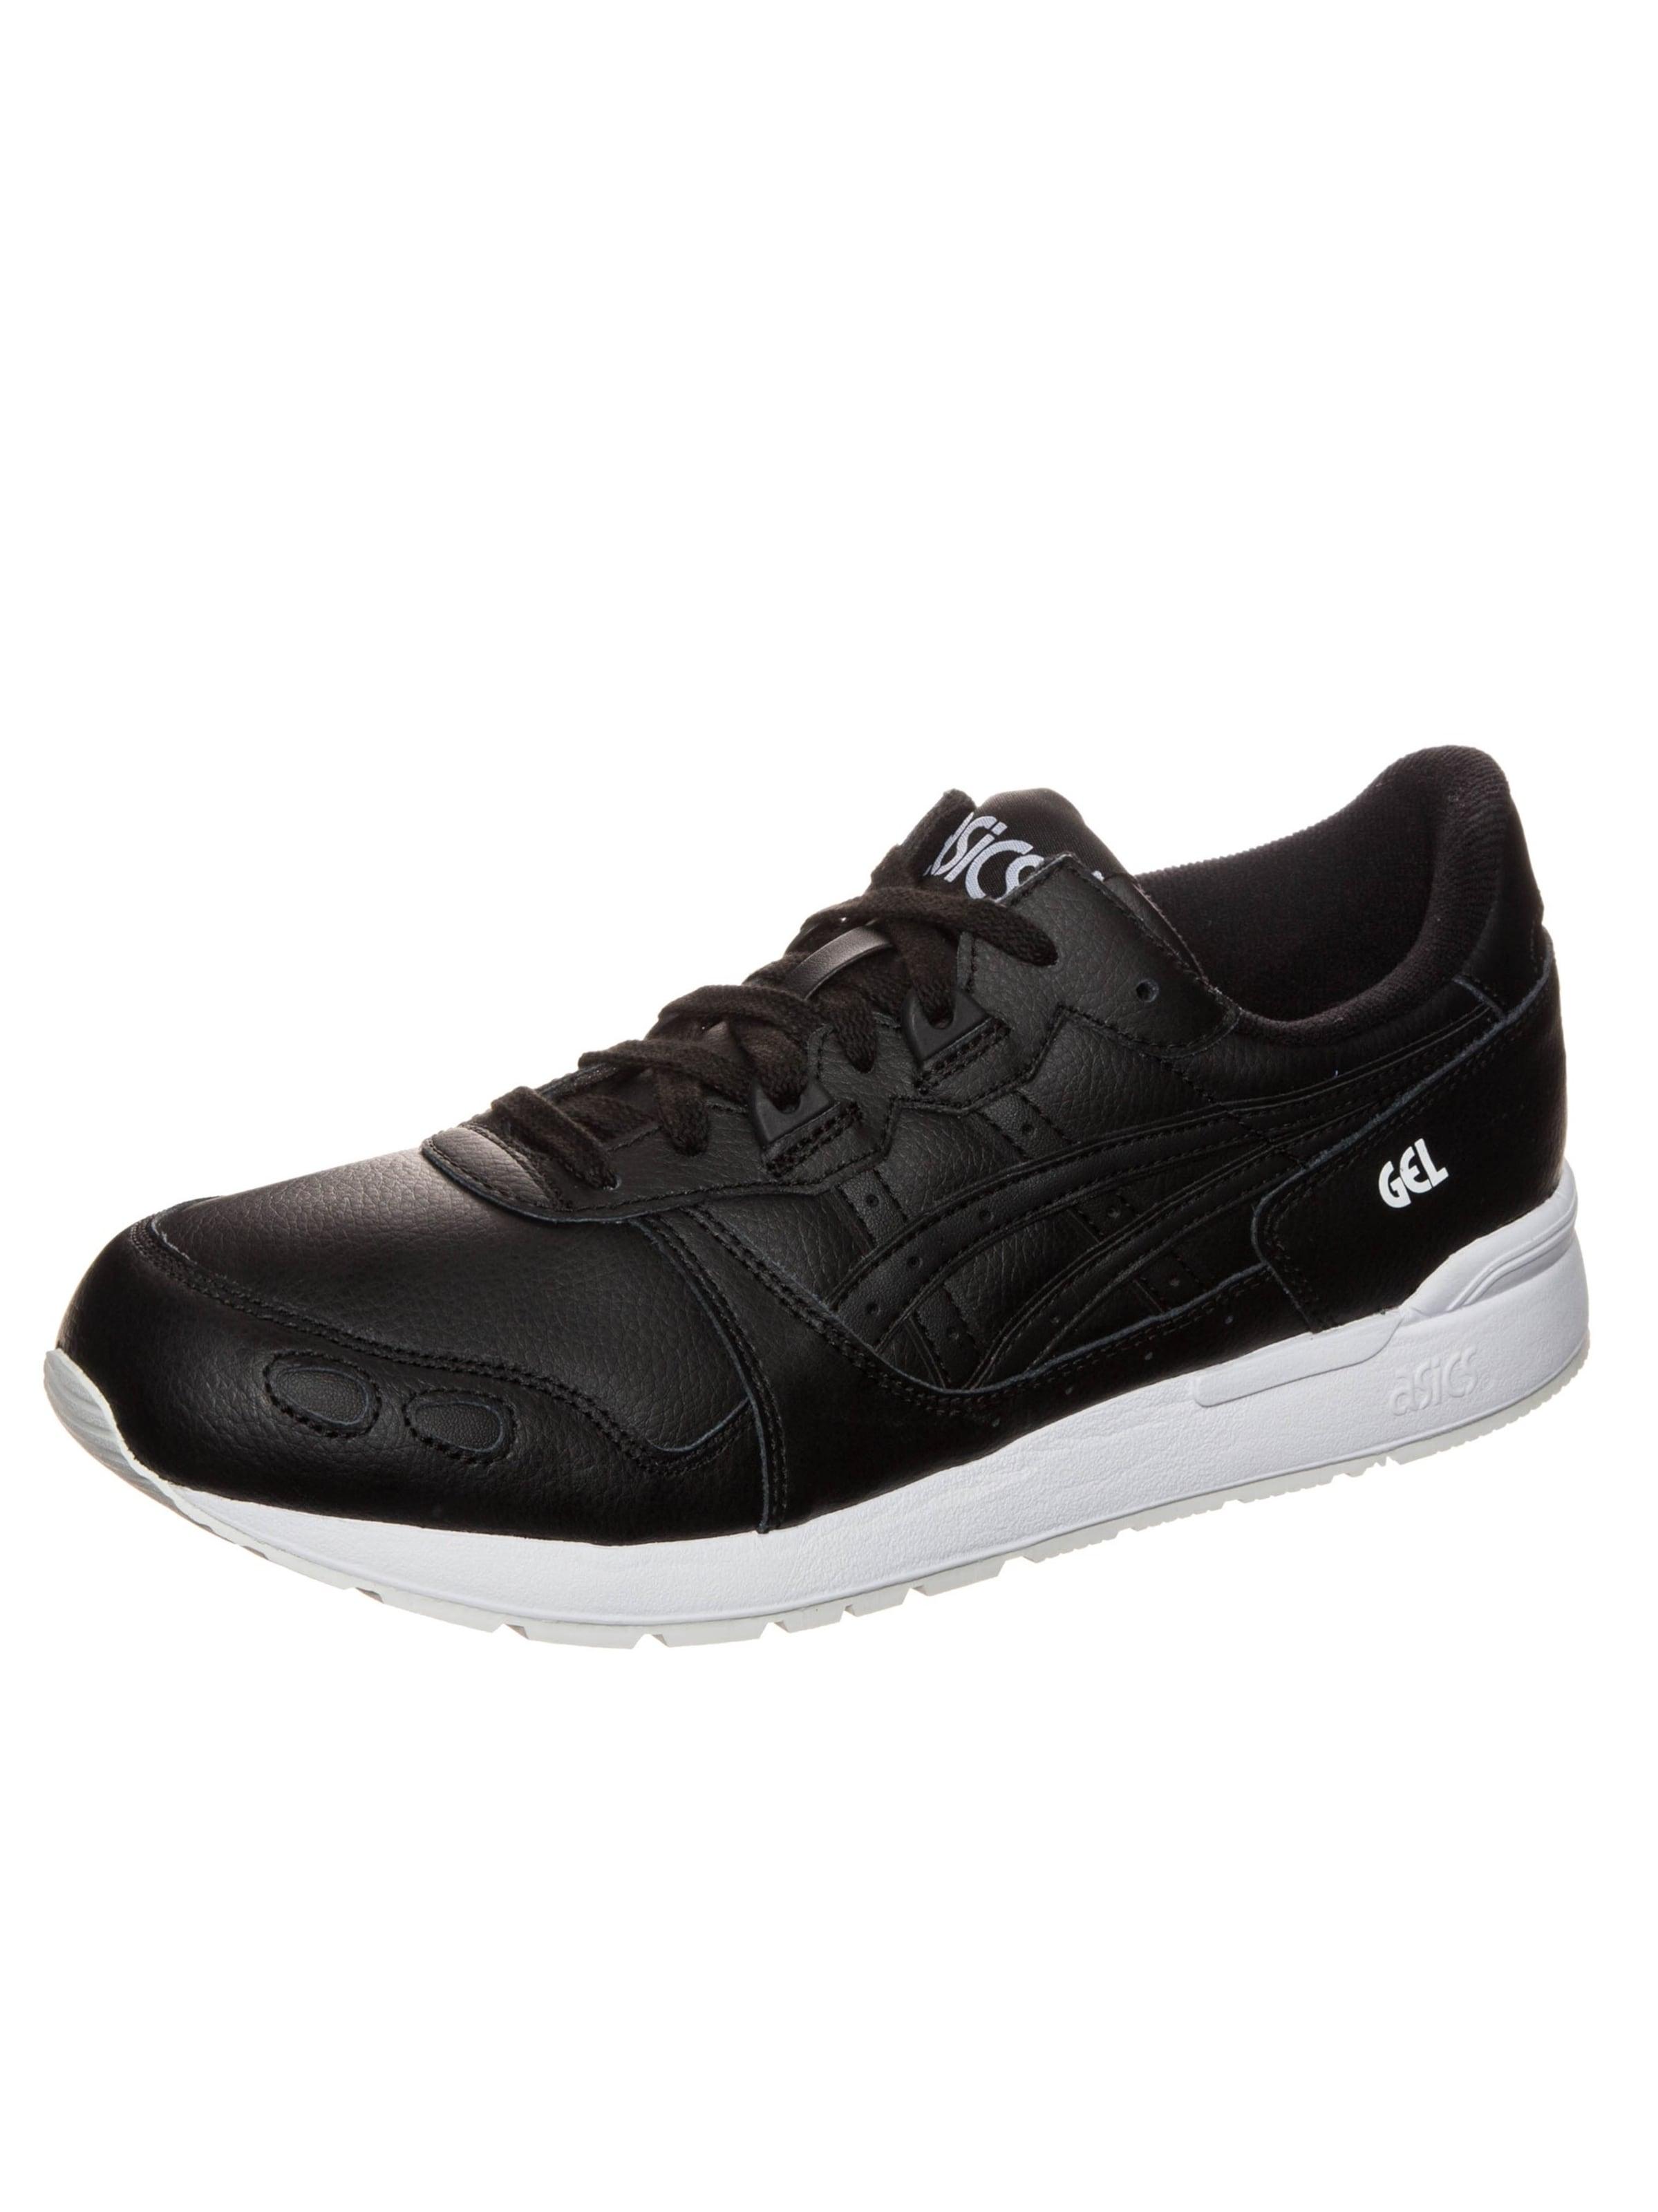 Asics Tiger Tiger Asics Sneaker  Gel-Lyte b39960